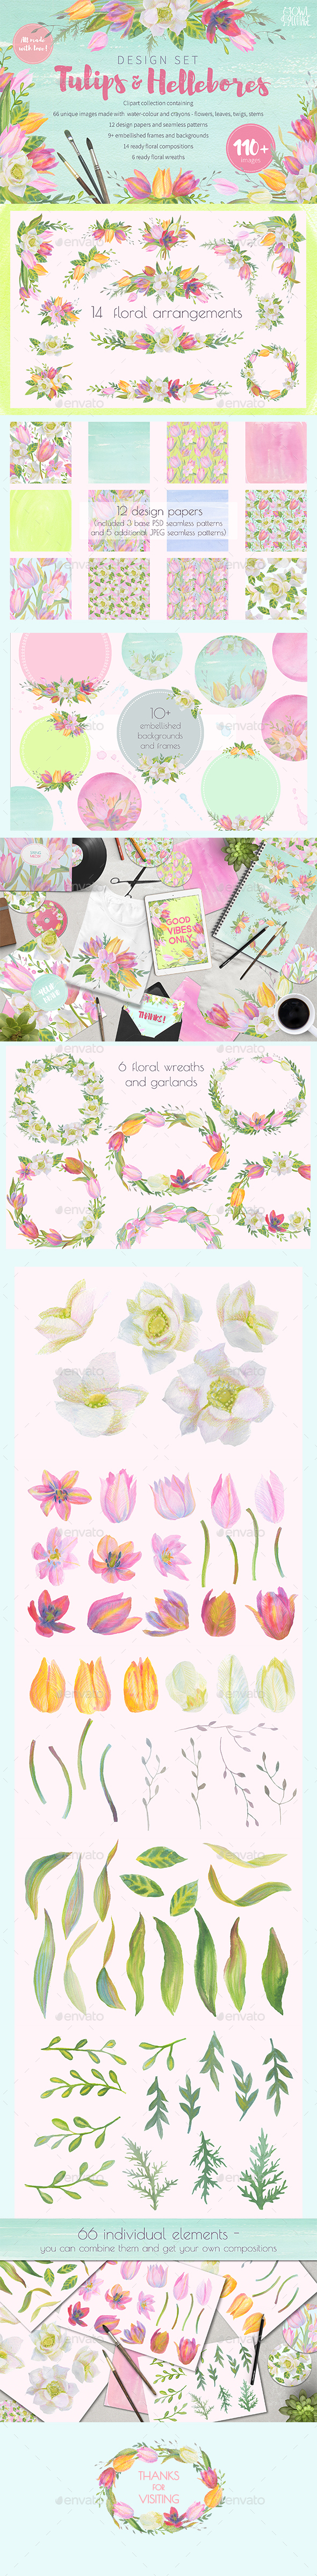 Floral Design Pack (Watercolor & Pastel) - Graphics